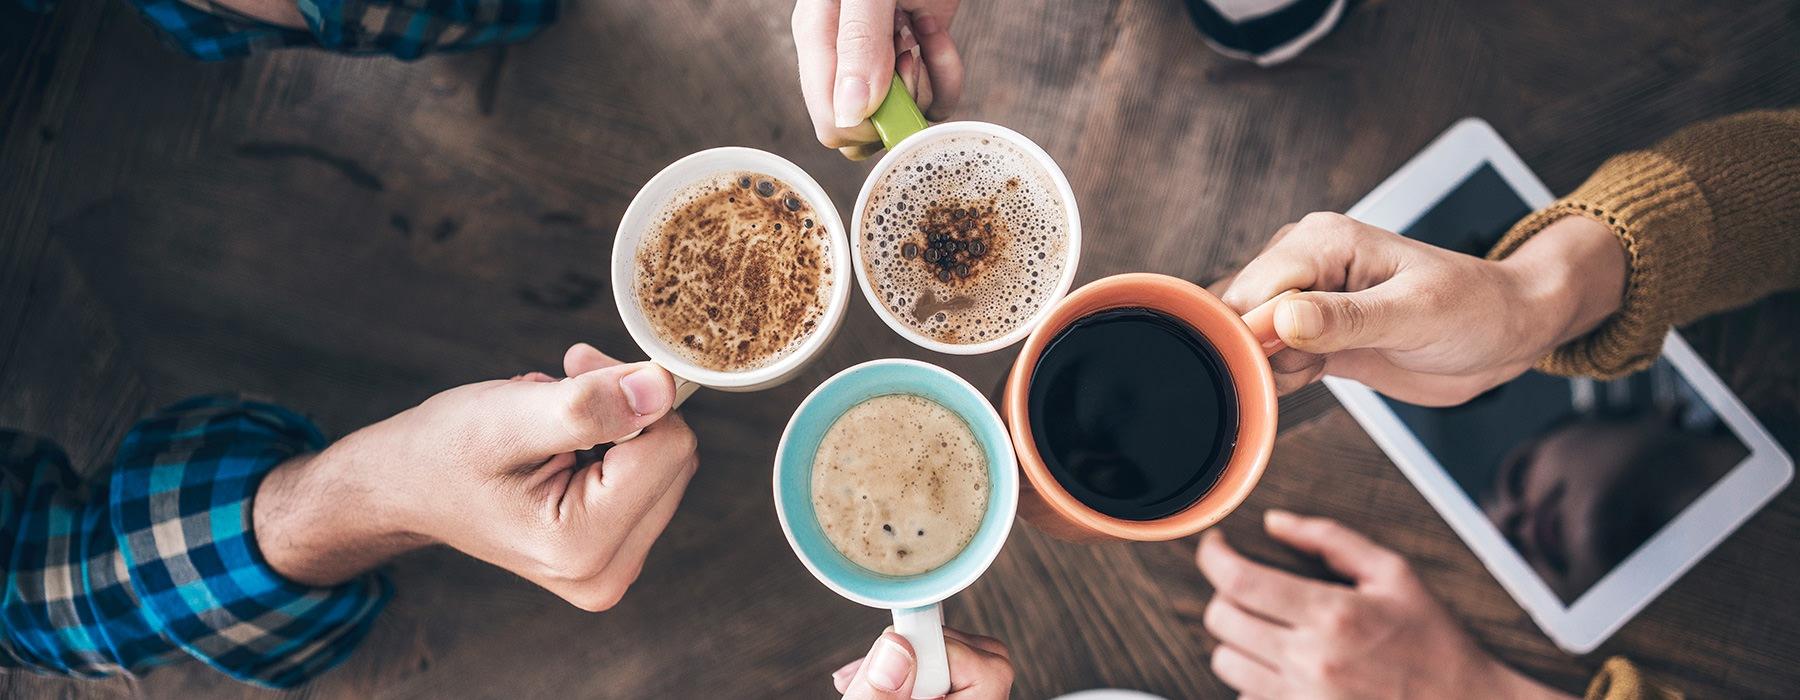 Friends toasting their coffee mugs